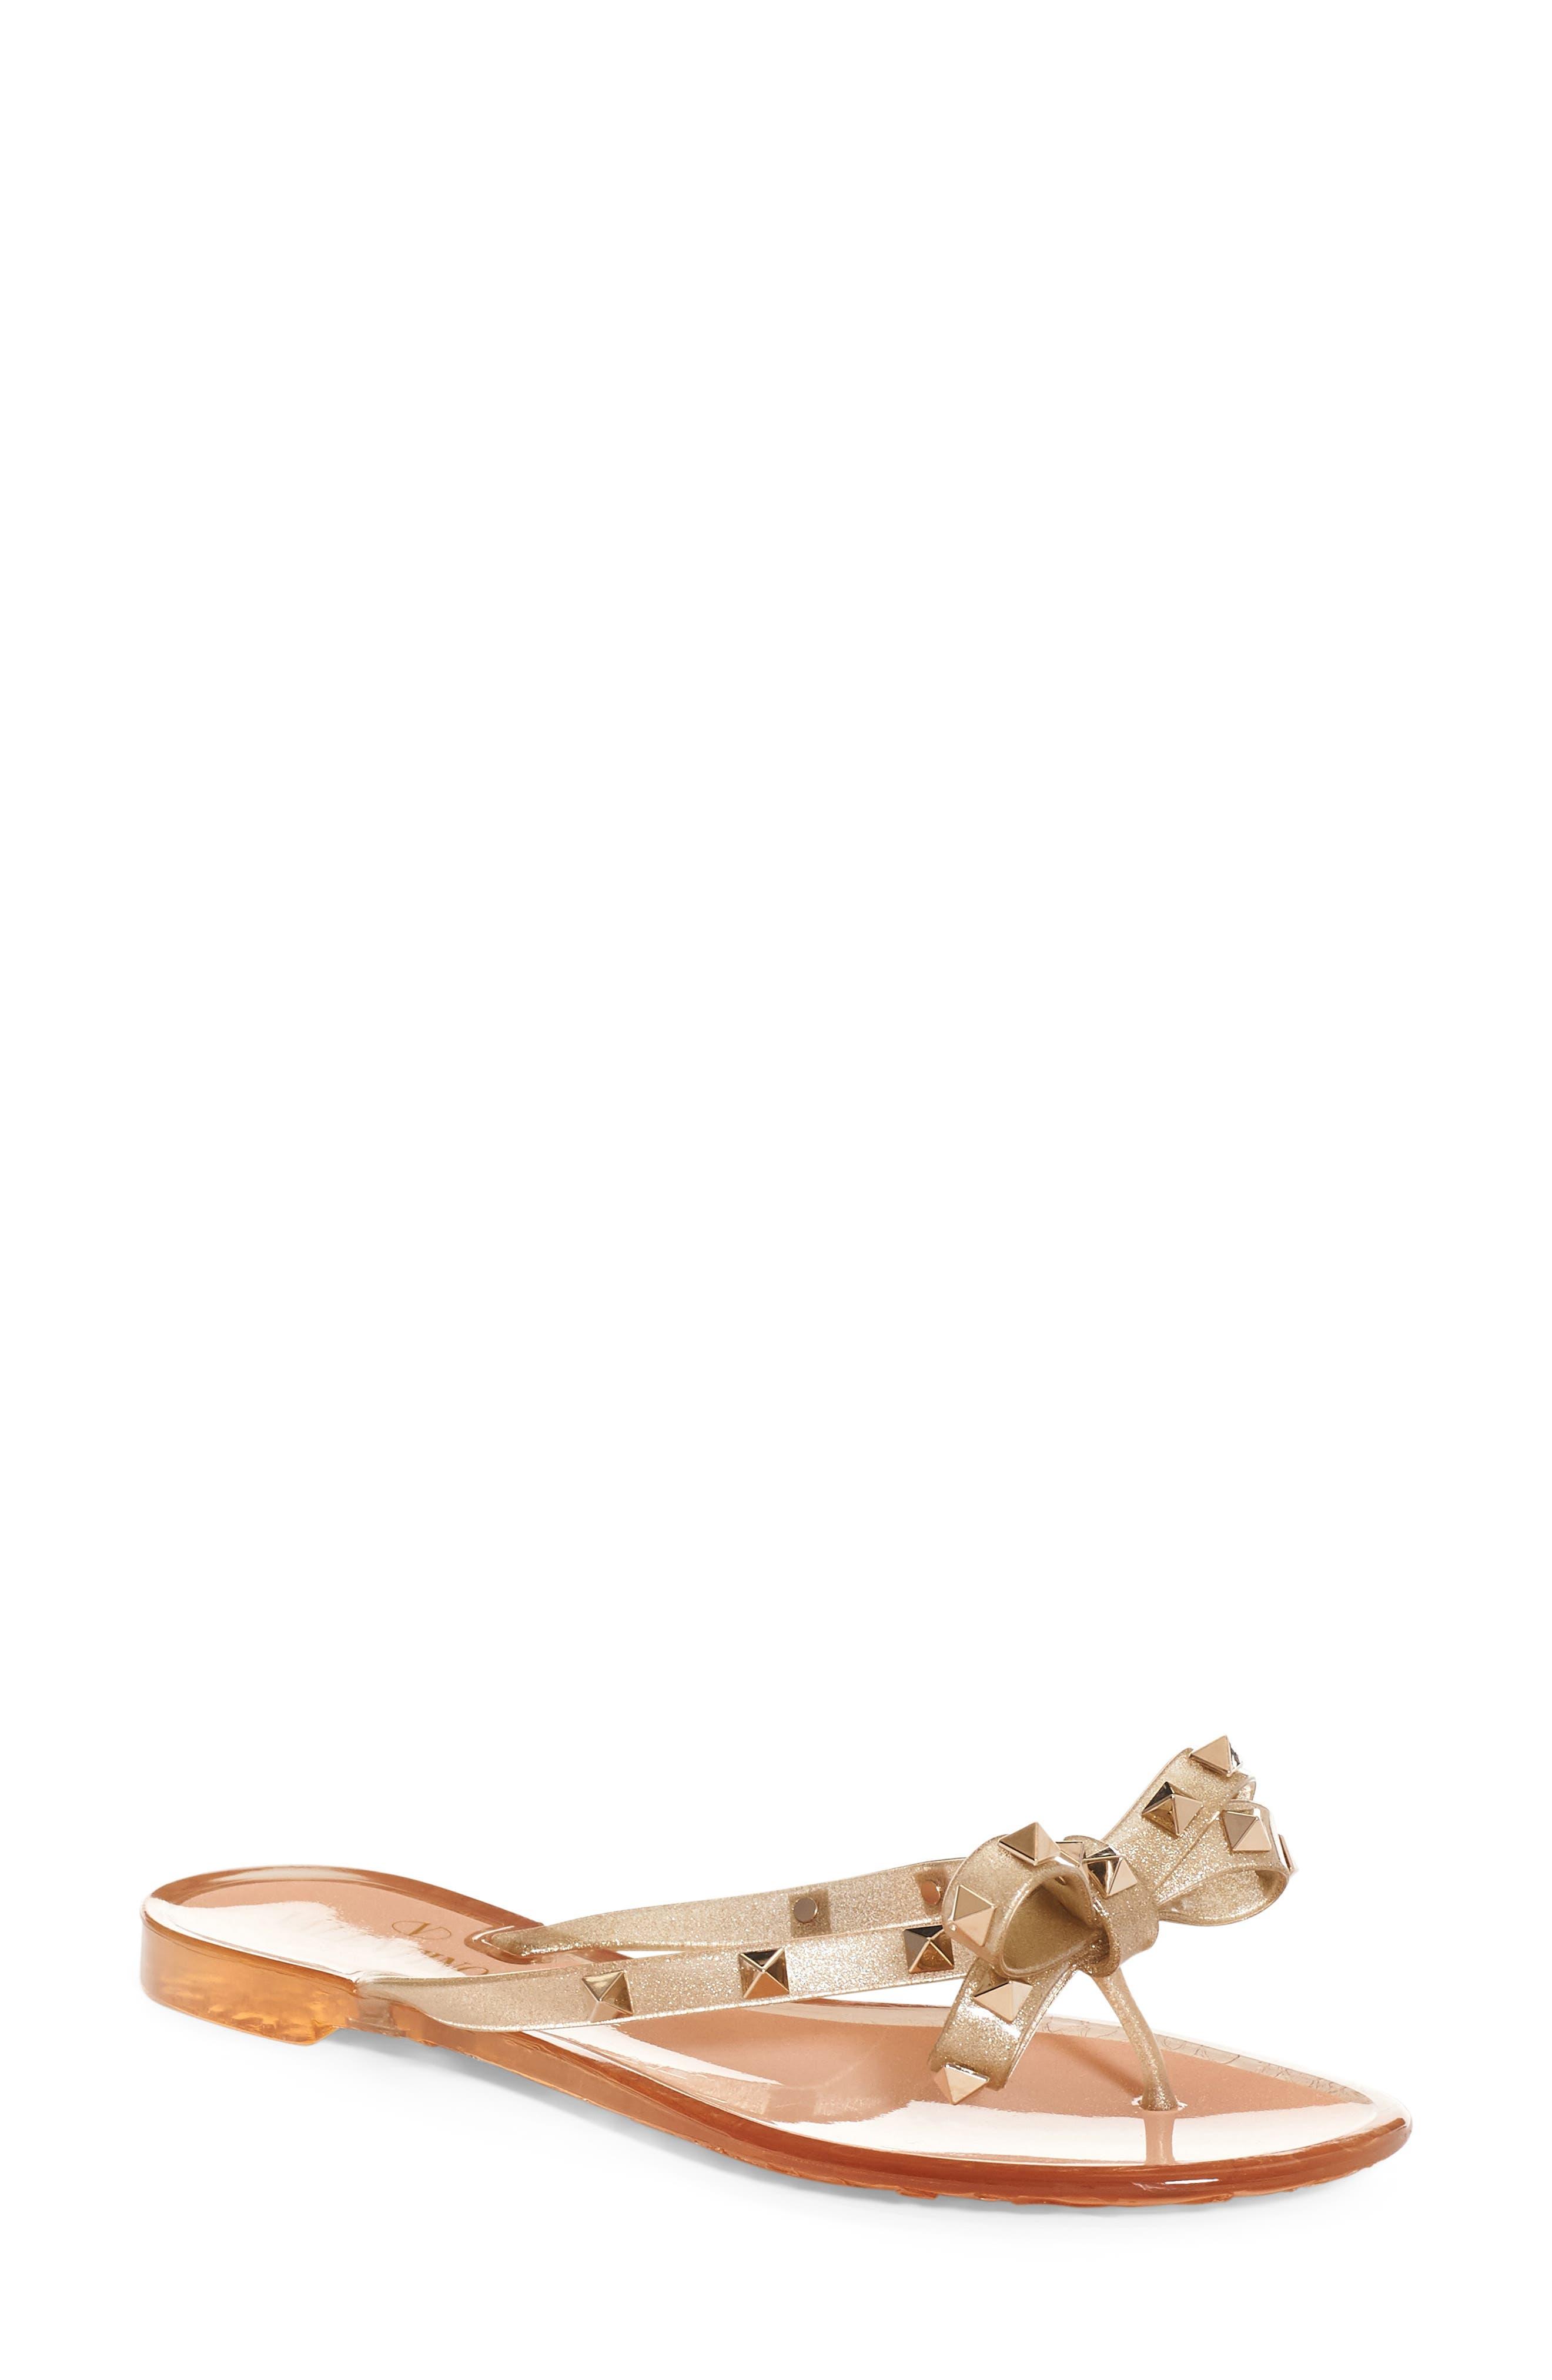 Alternate Image 1 Selected - Valentino 'Rockstud' Flip Flop (Women)